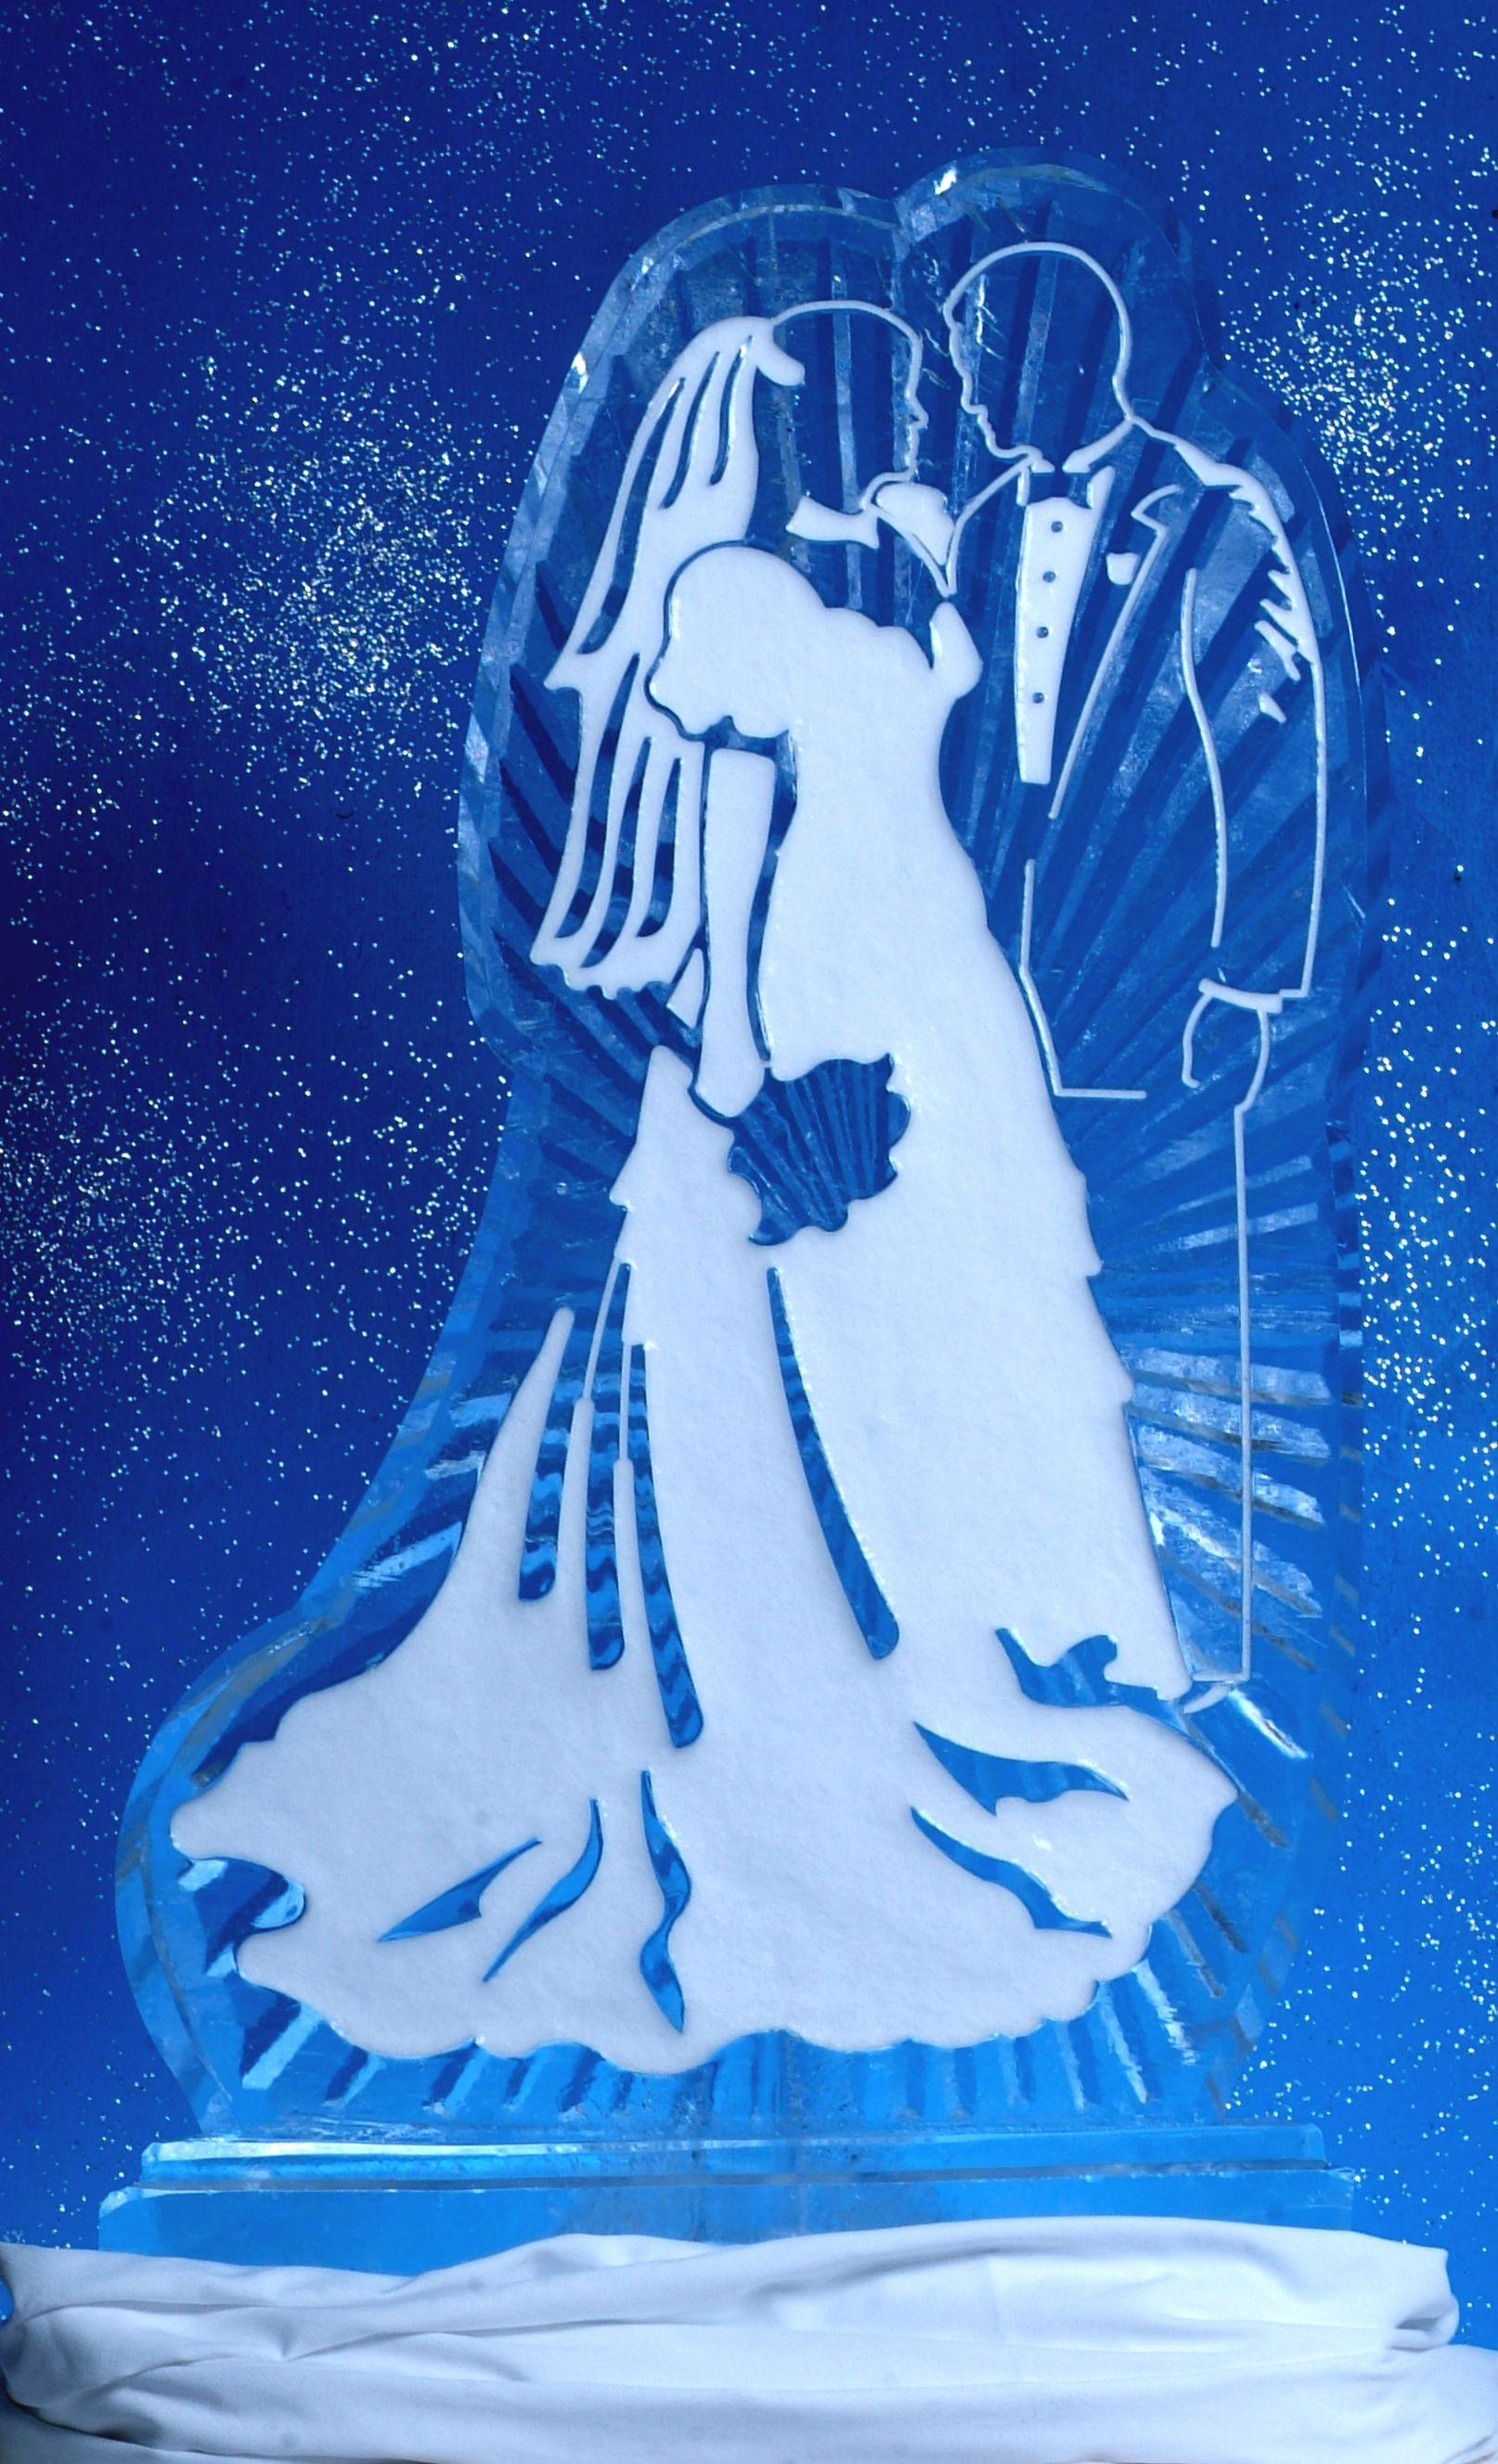 Snowed Couple